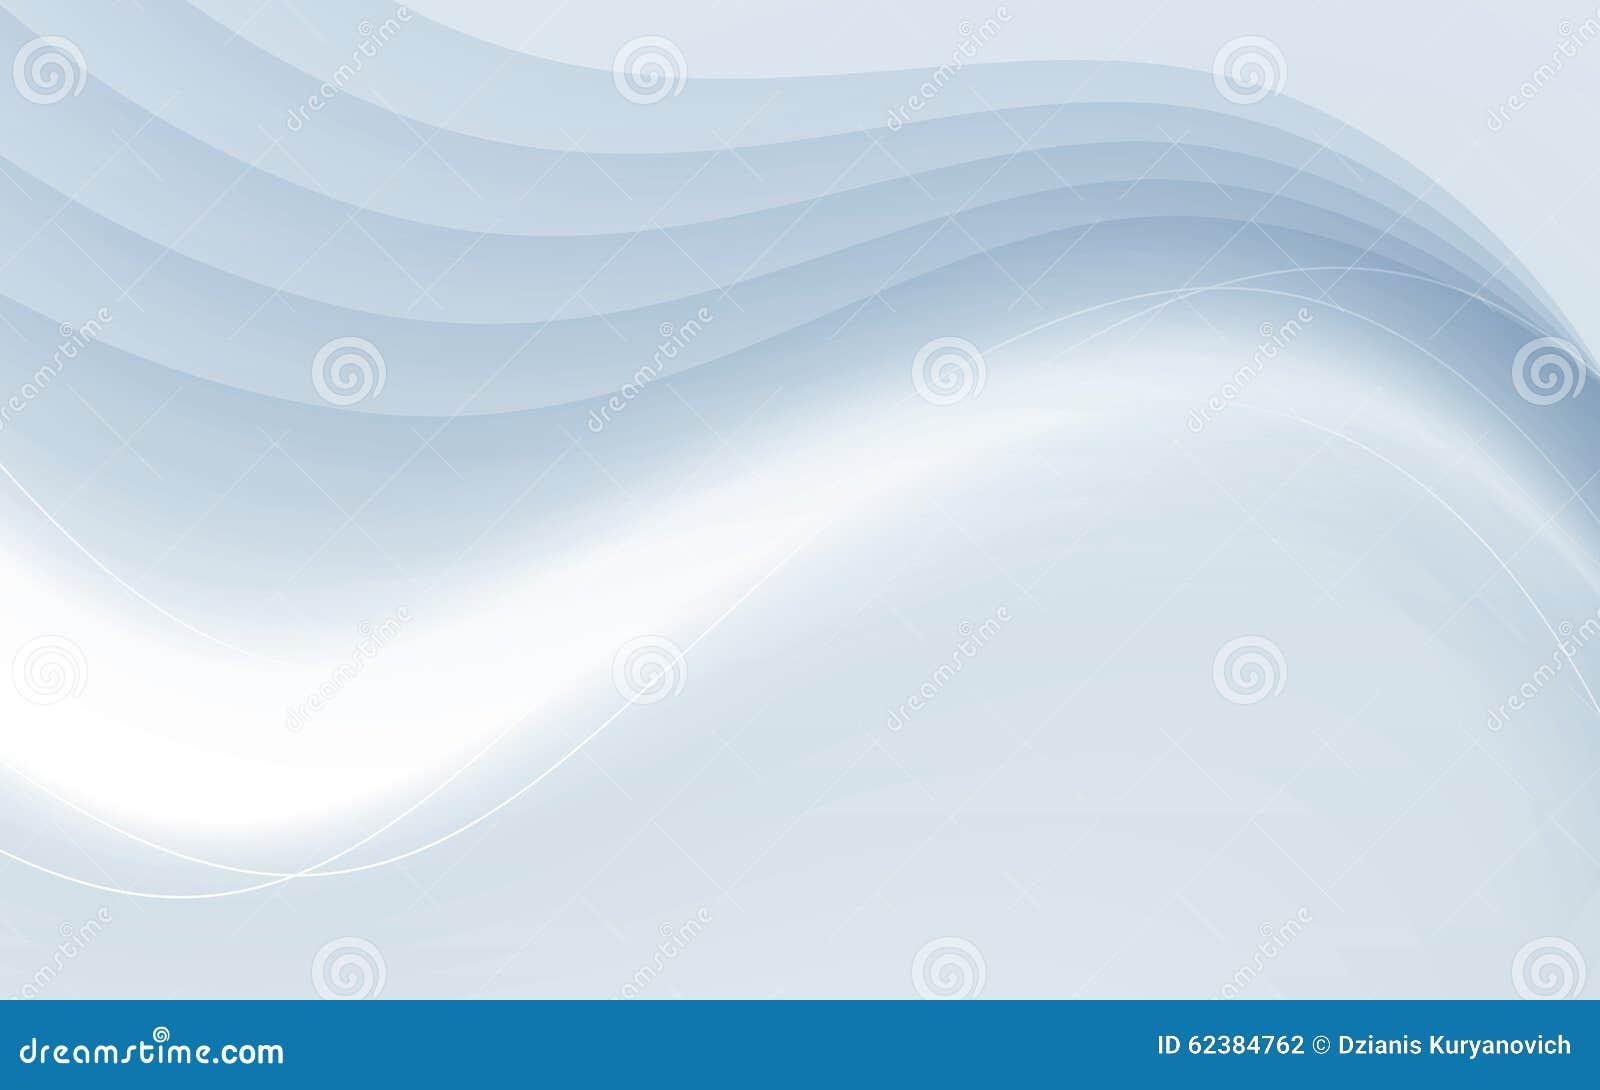 Transparent soft futuristic satin swoosh border certificate business card abstract modern hi-tech background. Vector